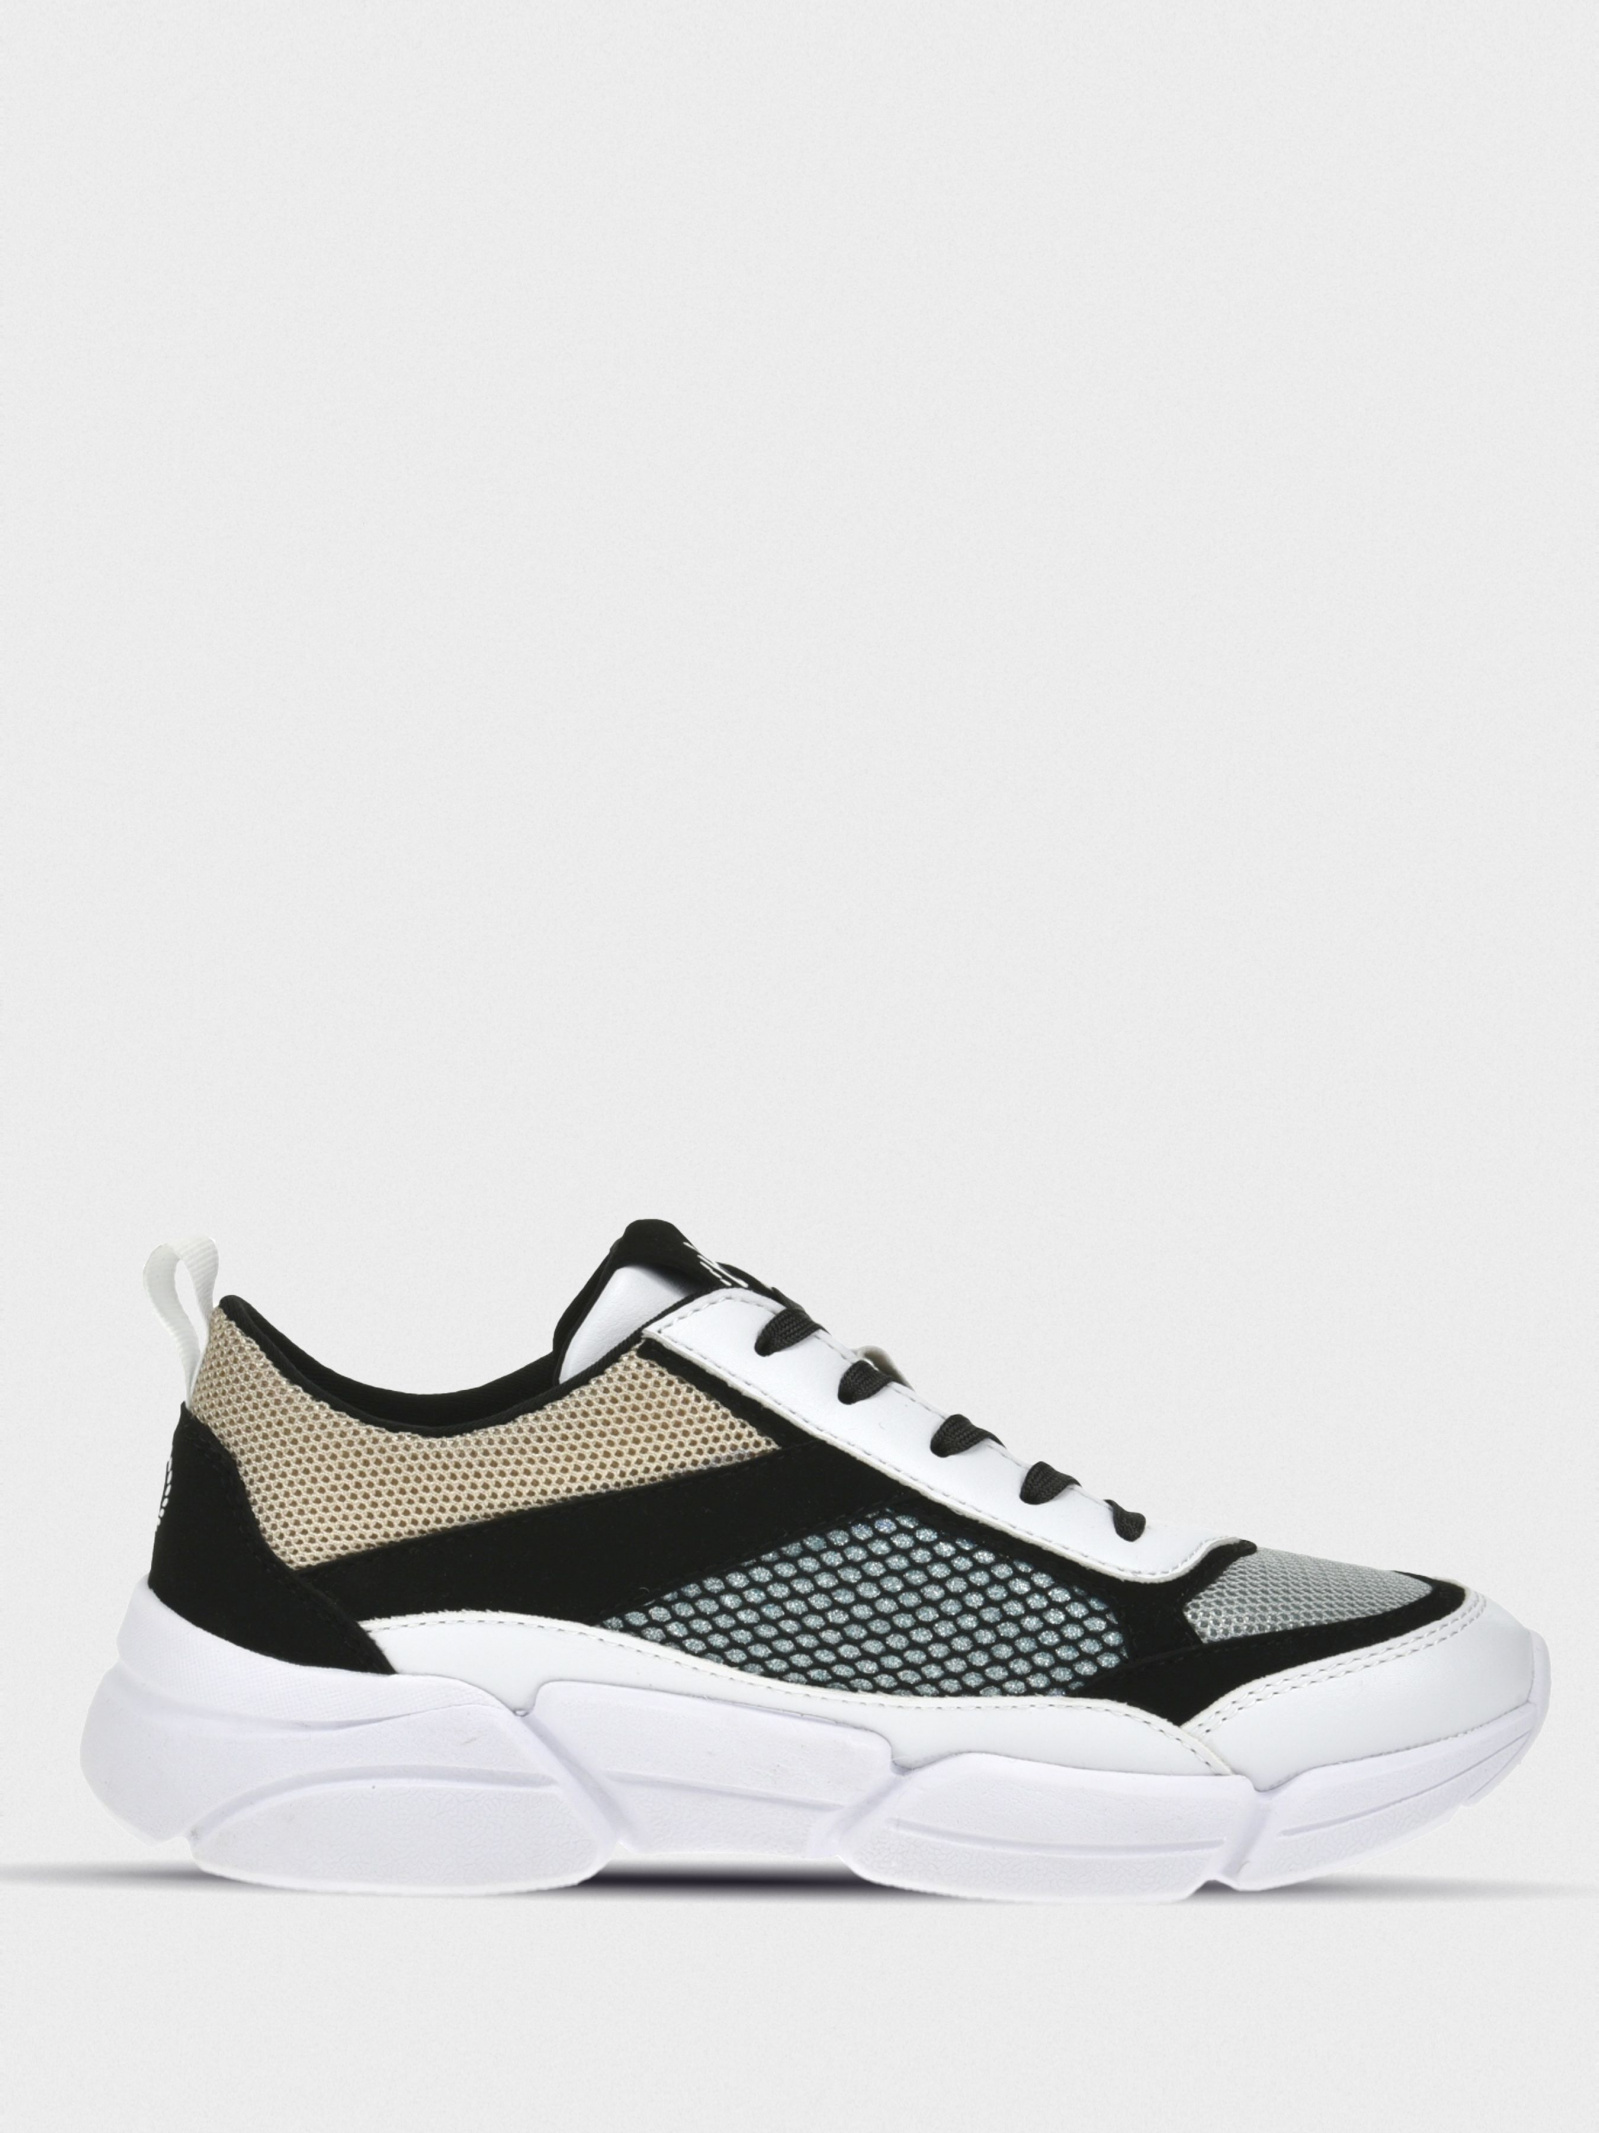 Кроссовки для женщин Bugatti sneakers YE156 купить обувь, 2017